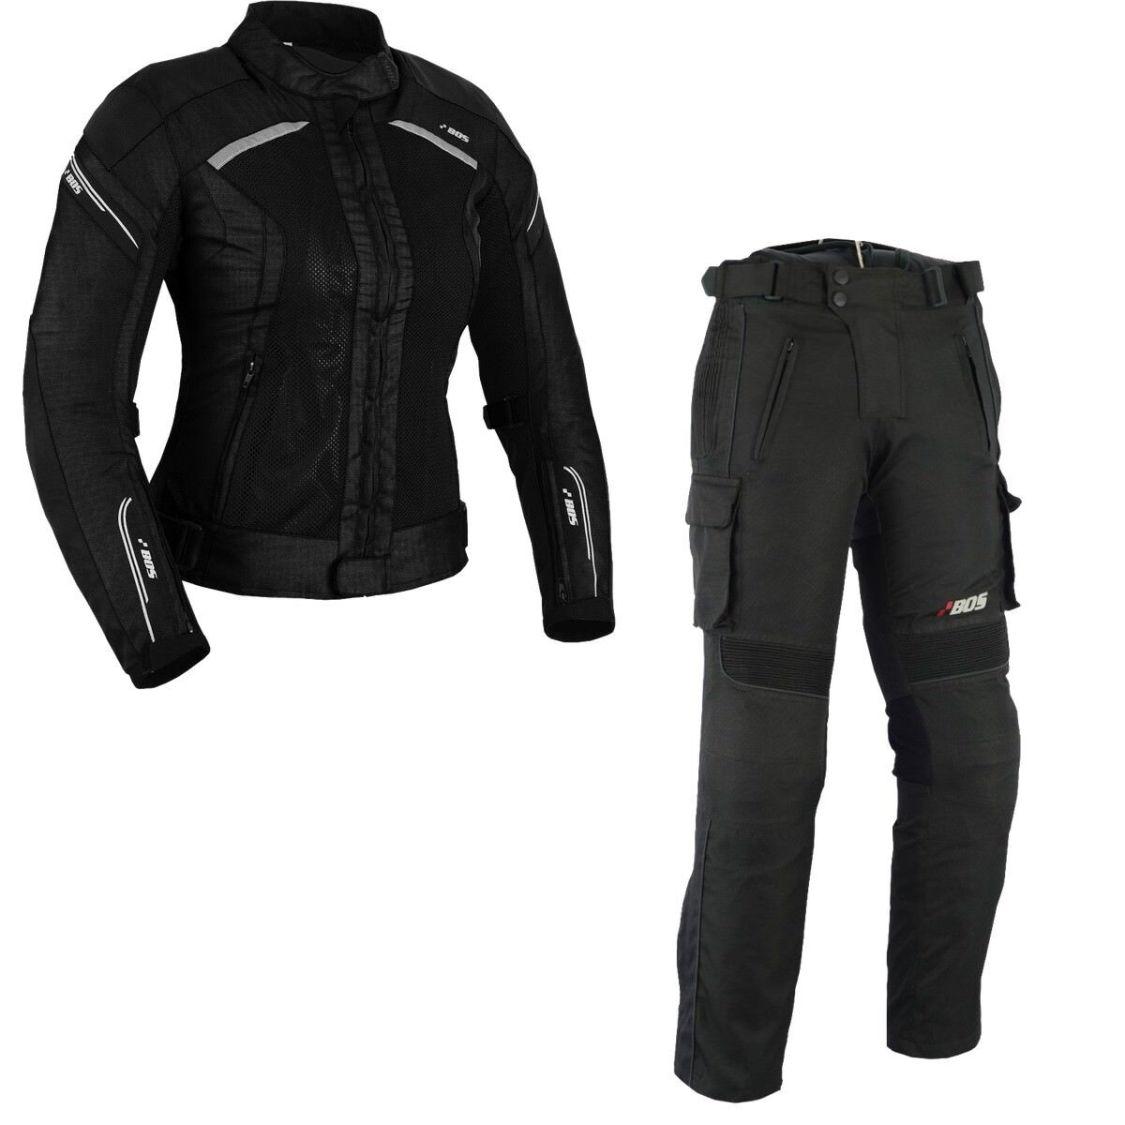 Damen Motorrad Kombi Damen Motorradkombi.Textil Jacke+Hose Mit Protektoren Kombi